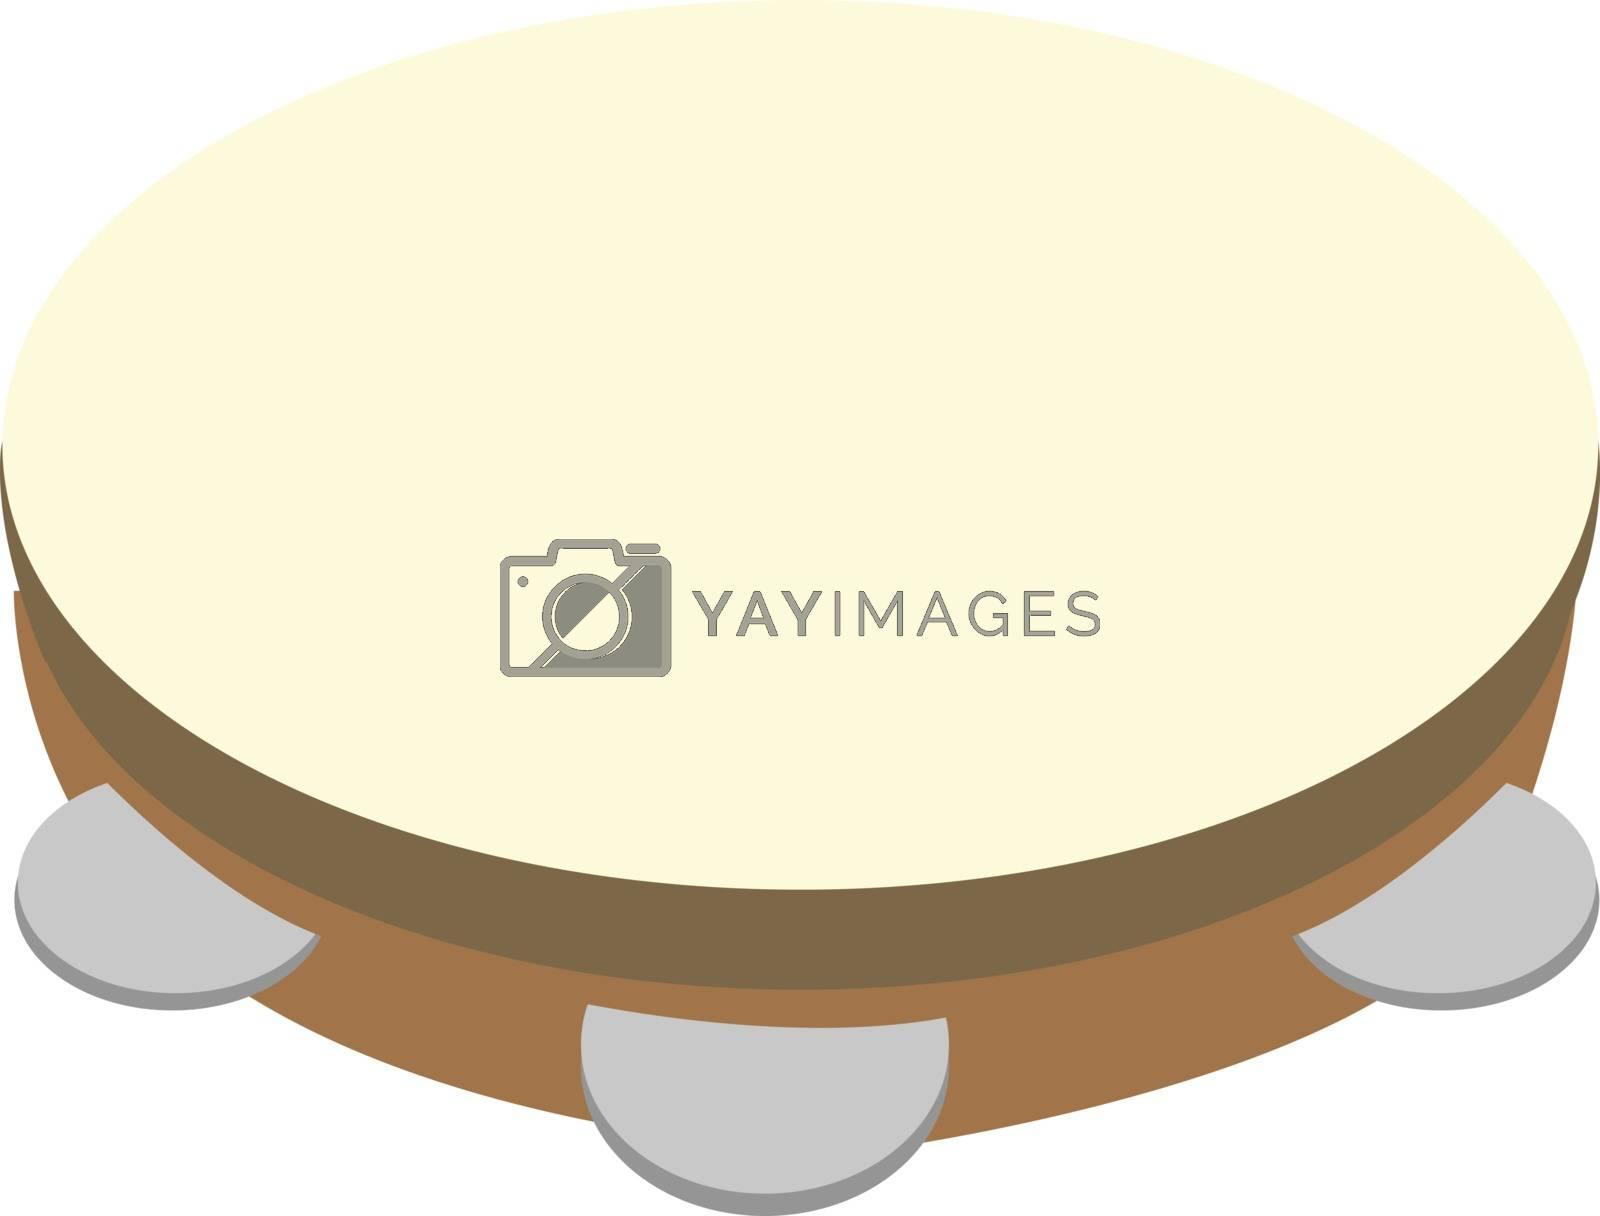 Tambourine, illustration, vector on white background.